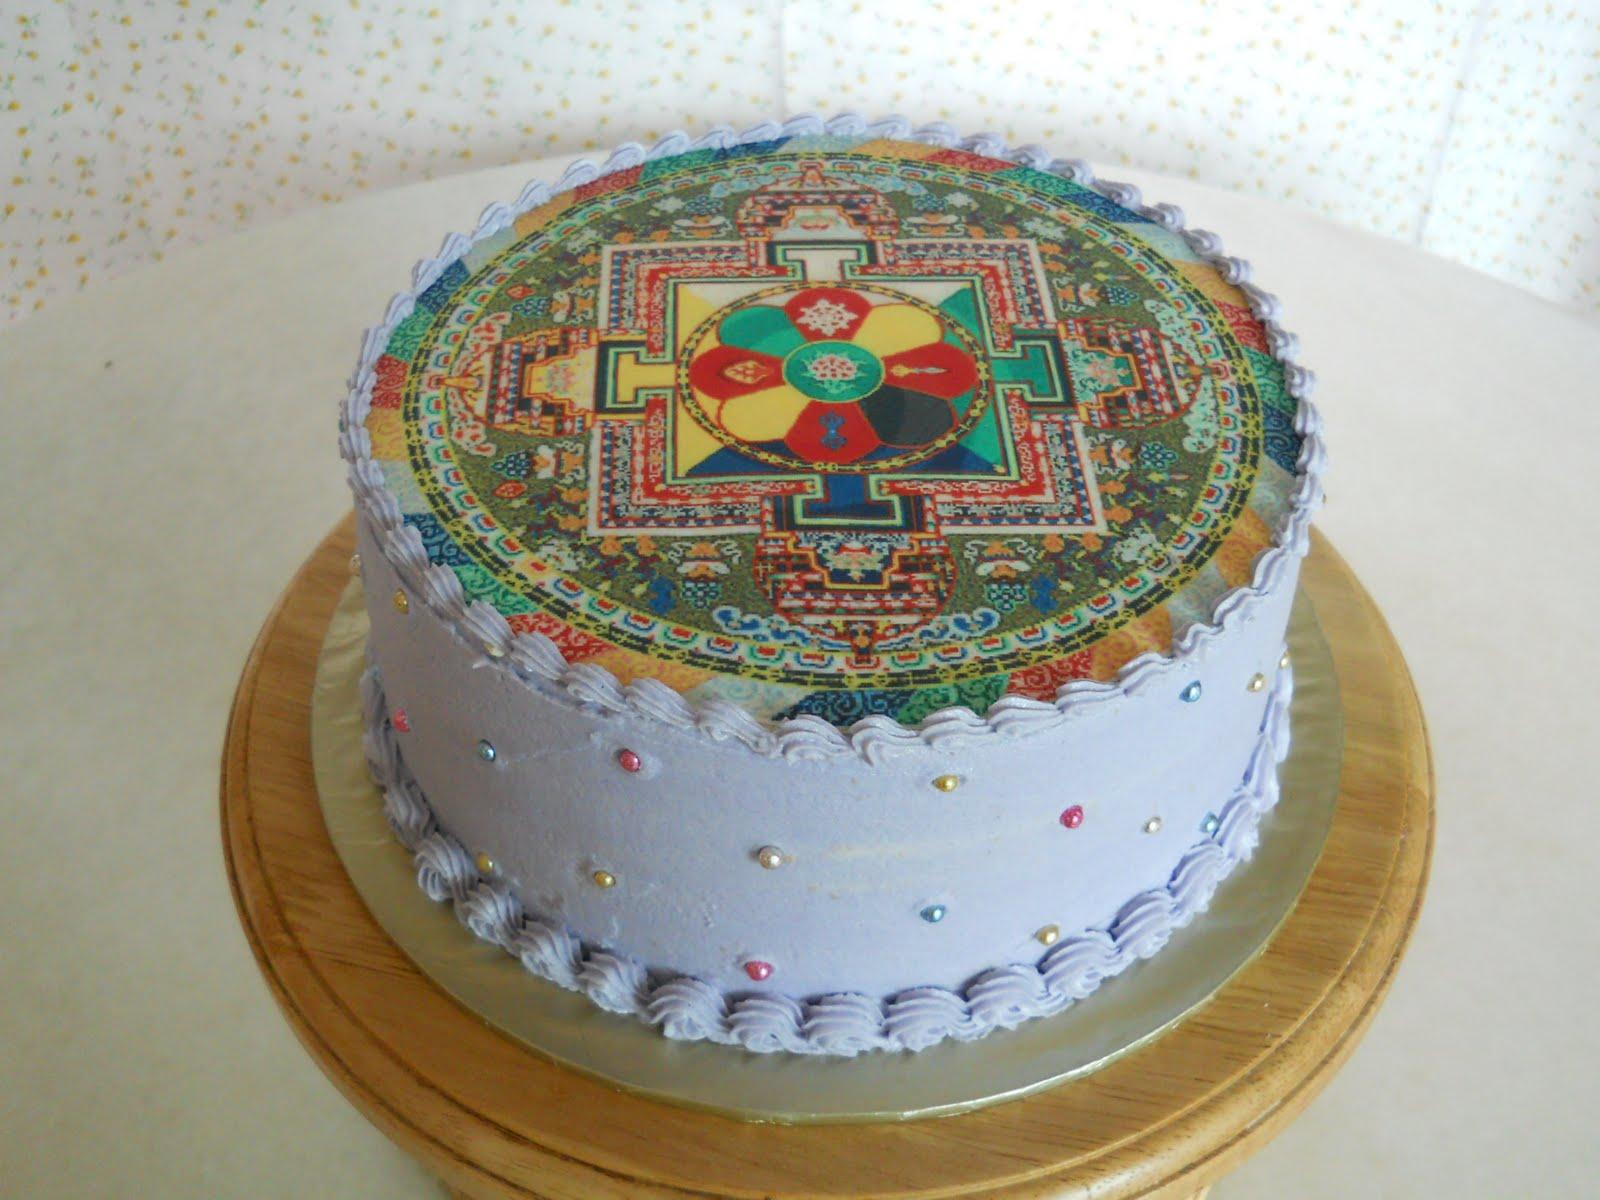 The Best Cakes In Town Tibetan Mandala Cake